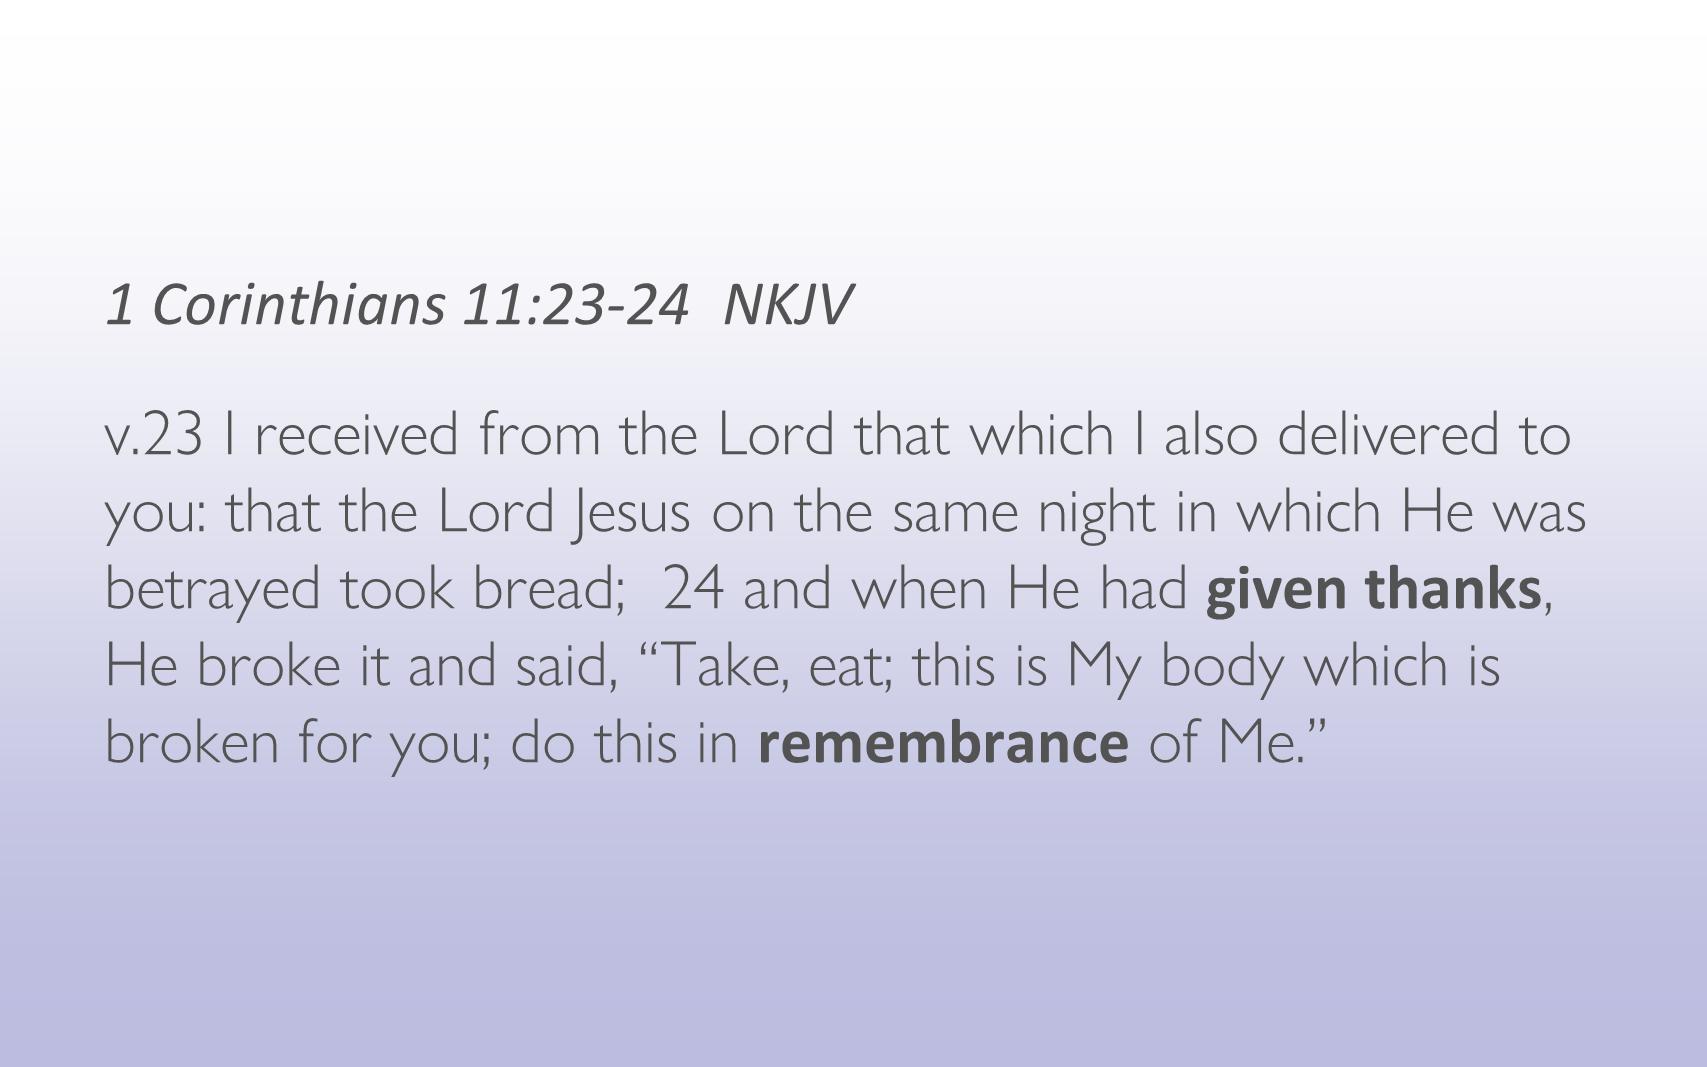 WCC-03 - Proclaiming Christ's Cross Regularly (4)